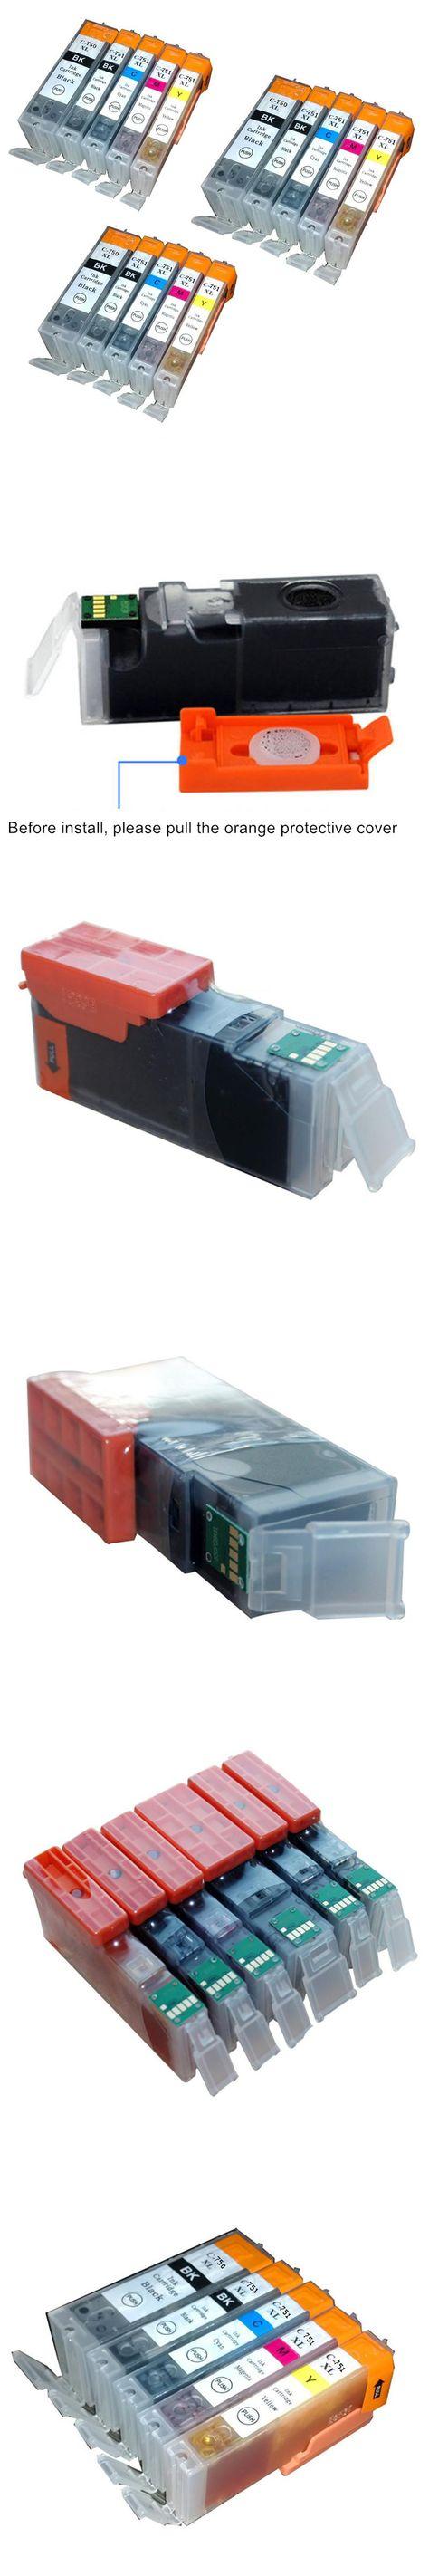 Canon Pixma Ix6870 Pictures Images Ink Cartridge Pgi 750xl Black 15pk Bulk 750 Xl Cli 751 For Mx72